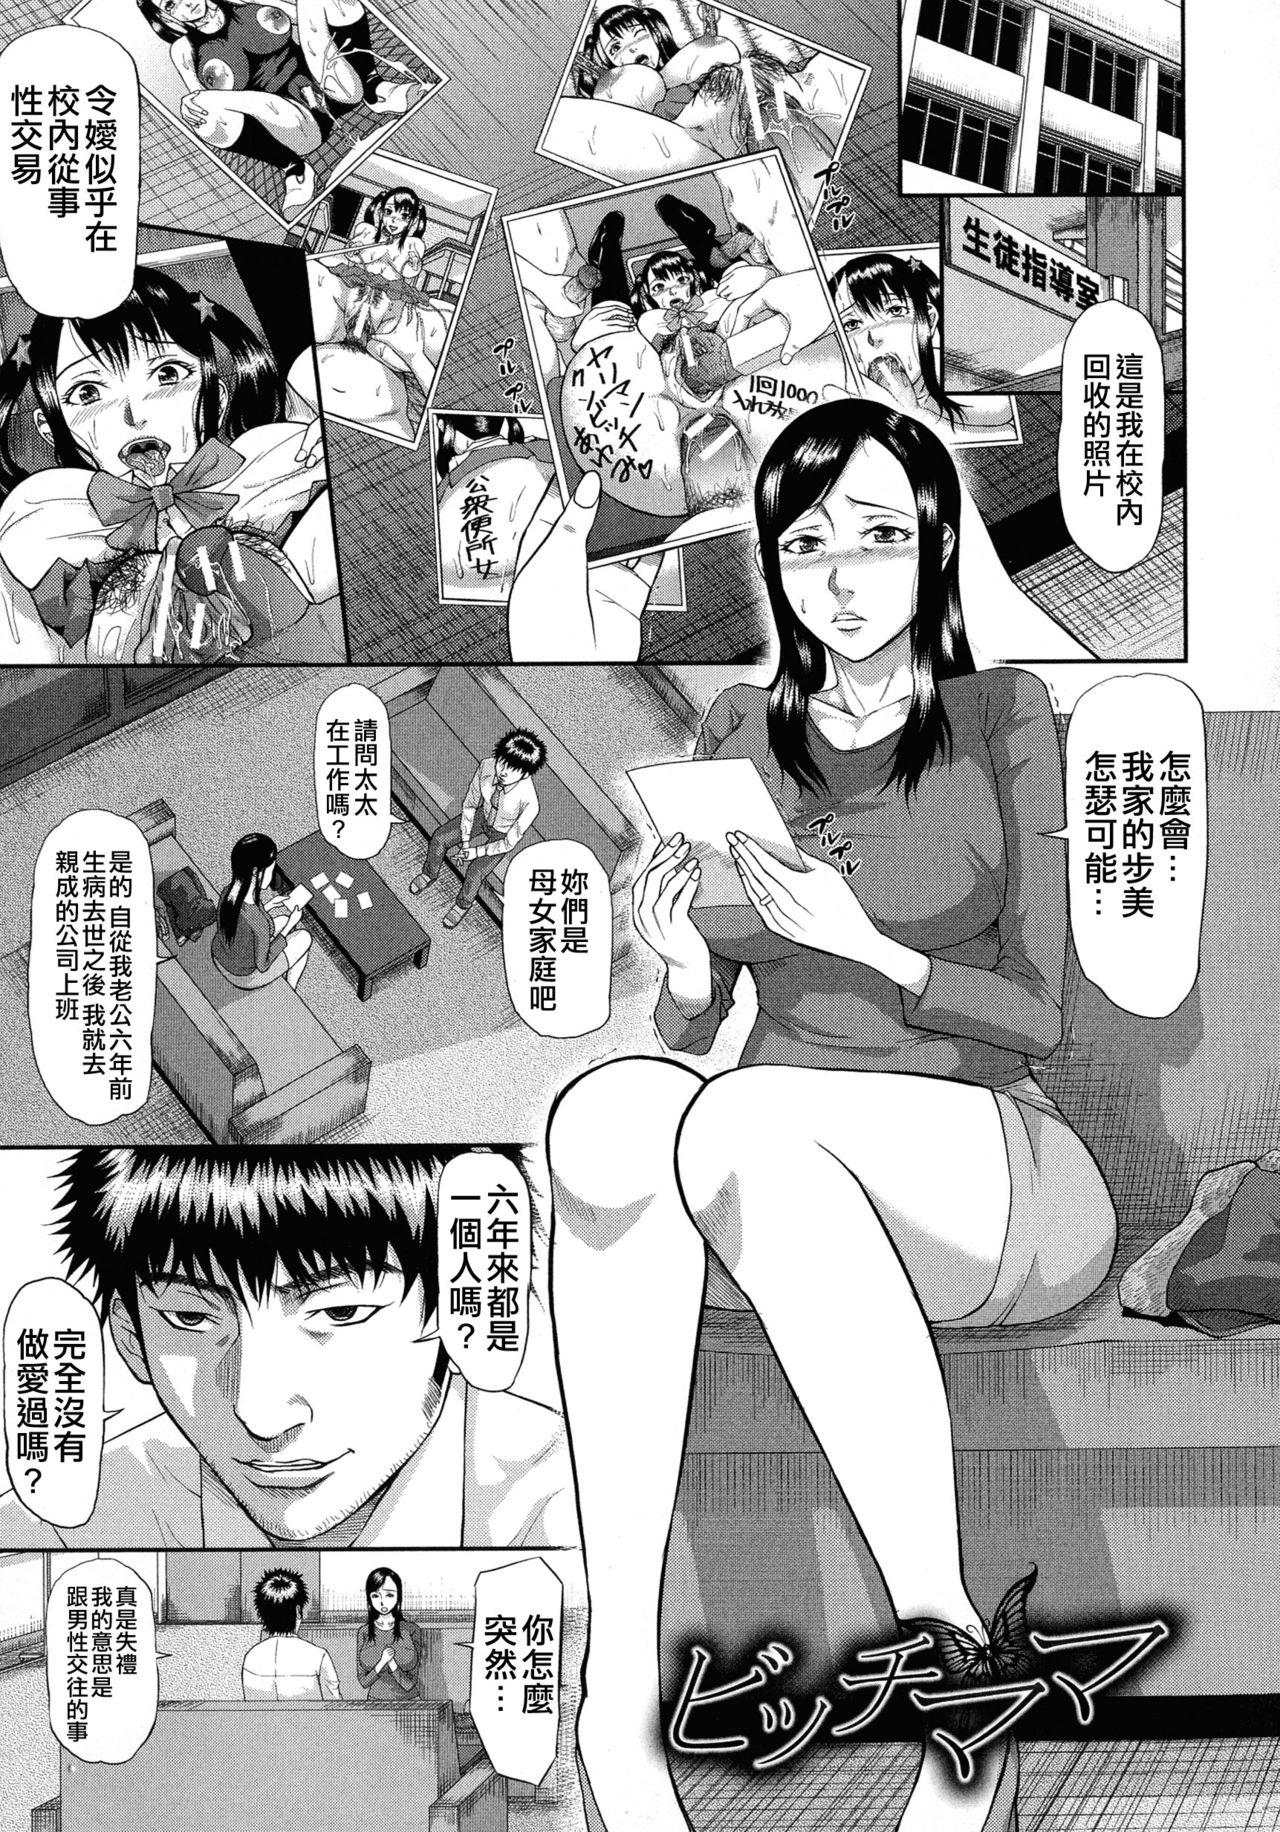 [Honebuto Danshaku] Innou Kaizou Program ~Oyako Zecchou Cult Ochi~ [Chinese]【不想记名重嵌--高质量图源】 137